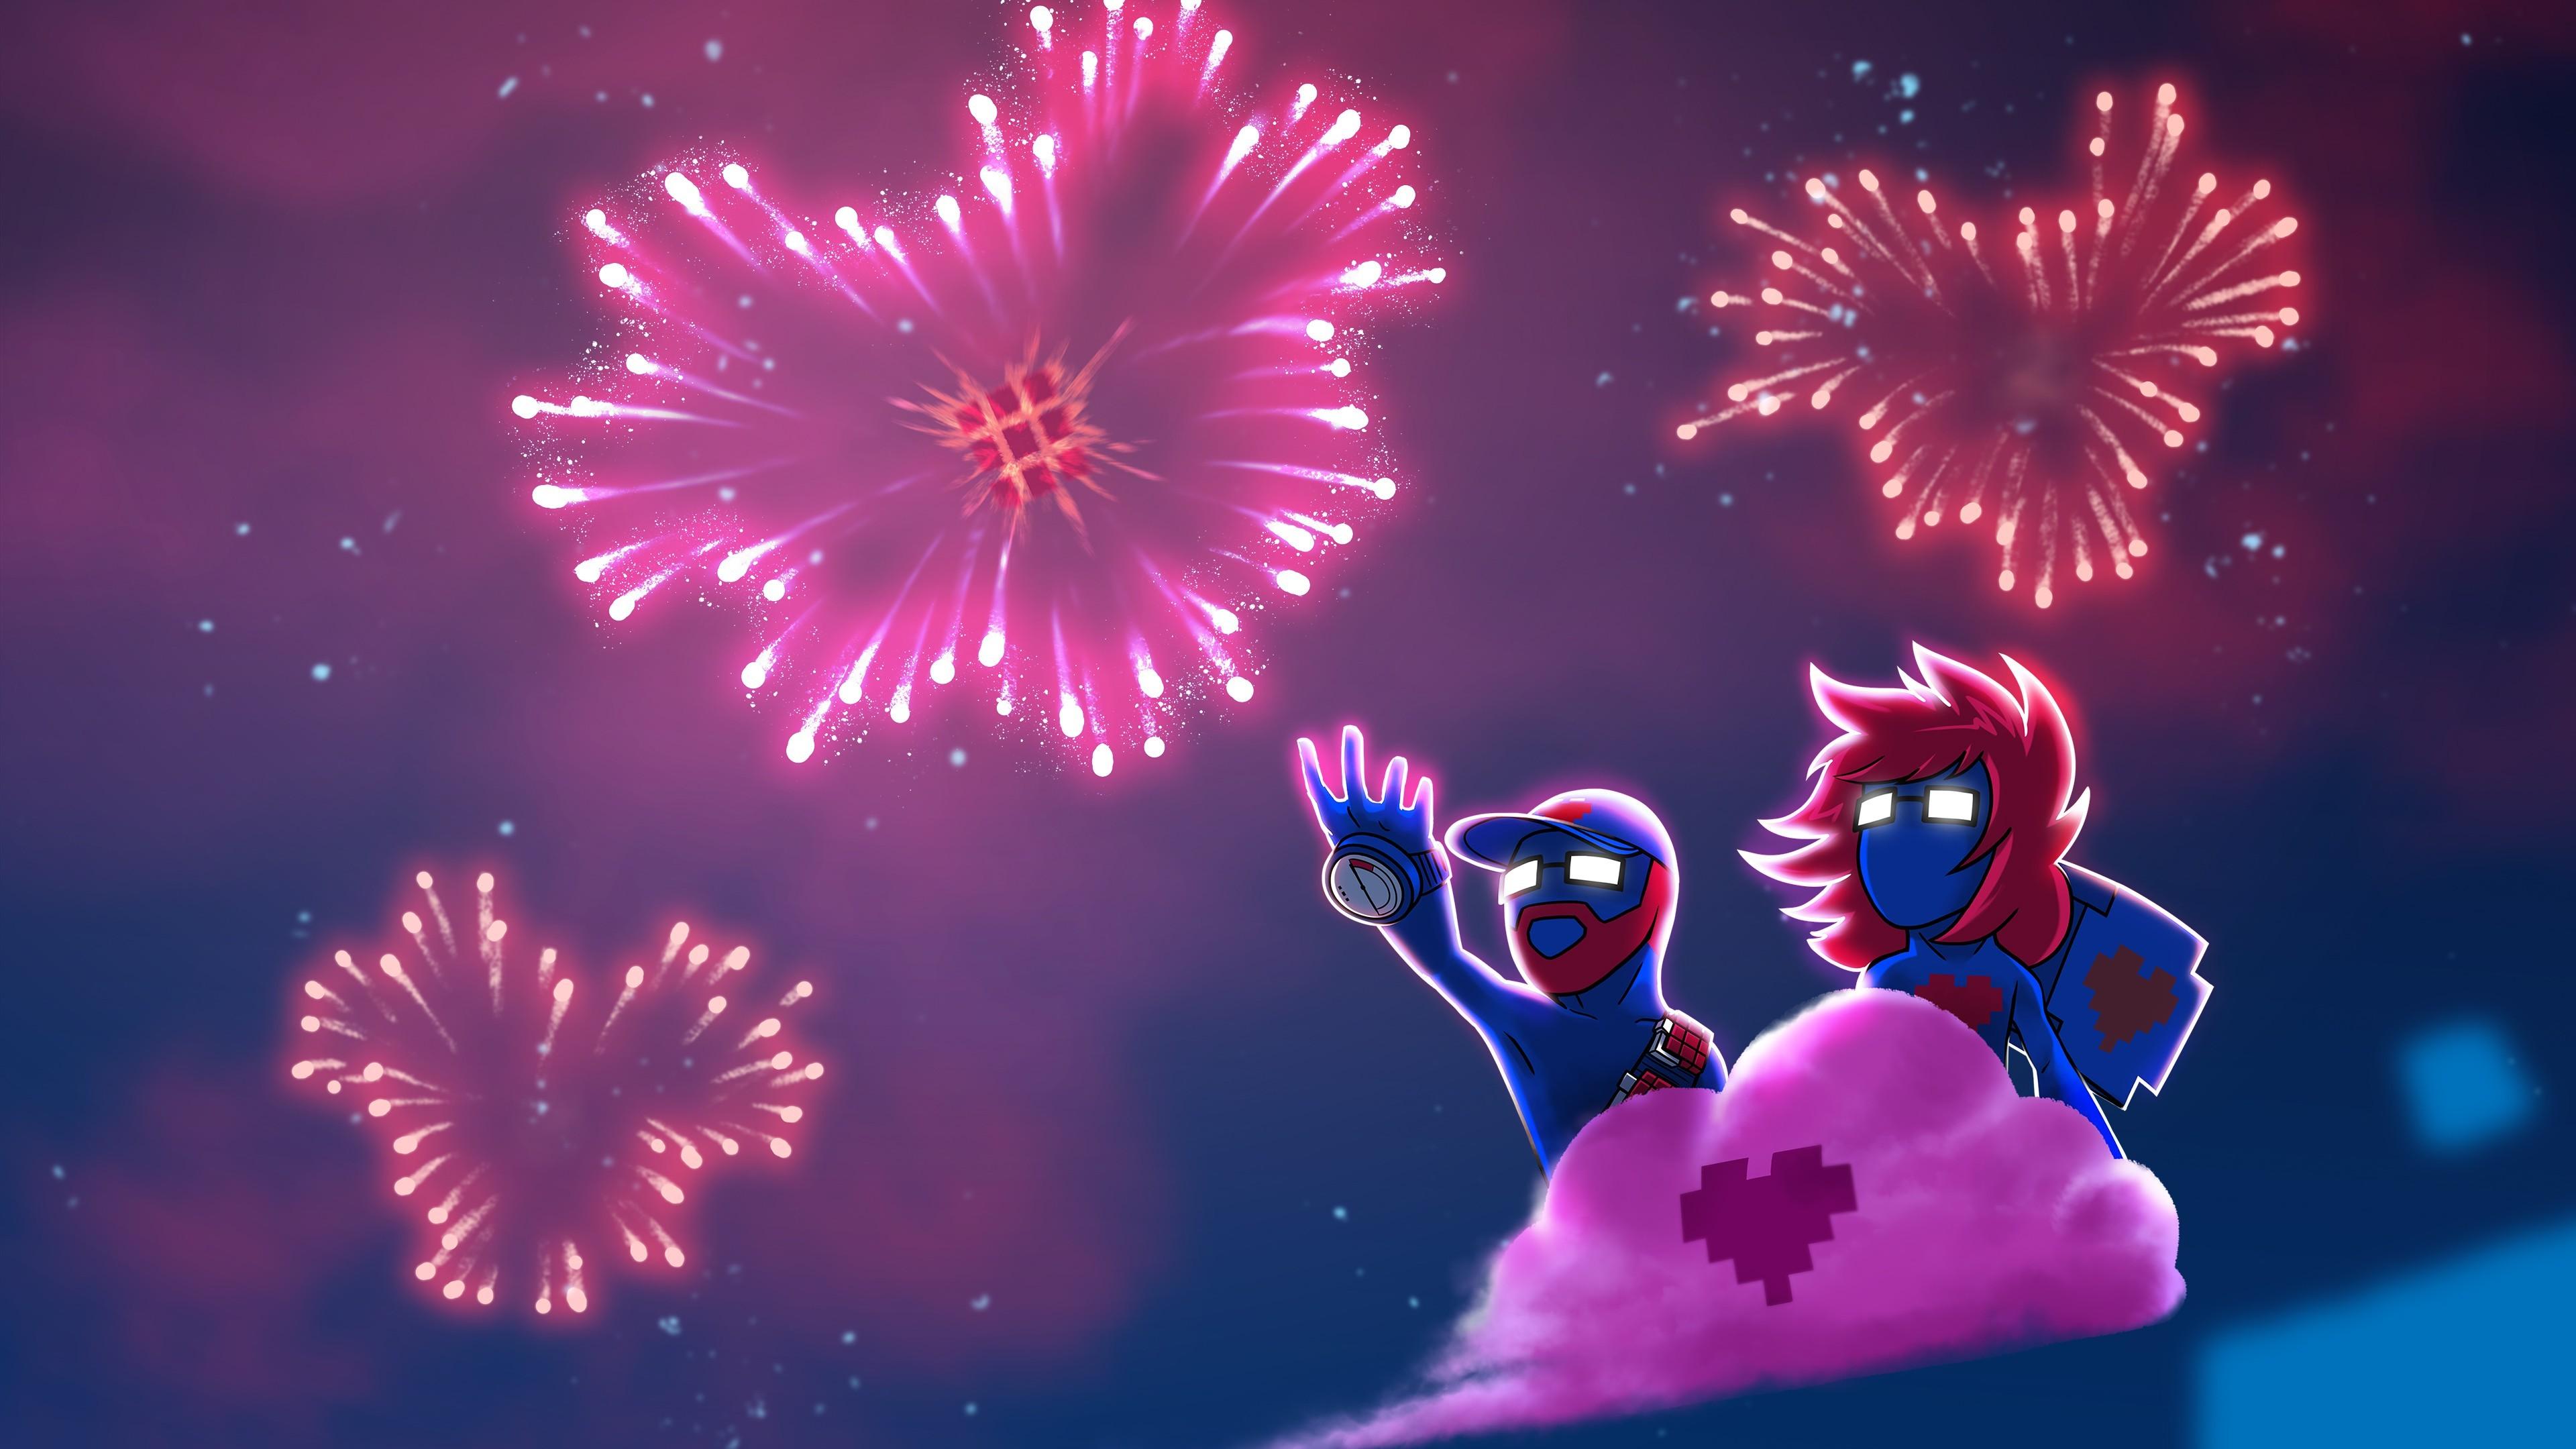 General Monstercat Pegboard Nerds fireworks clouds